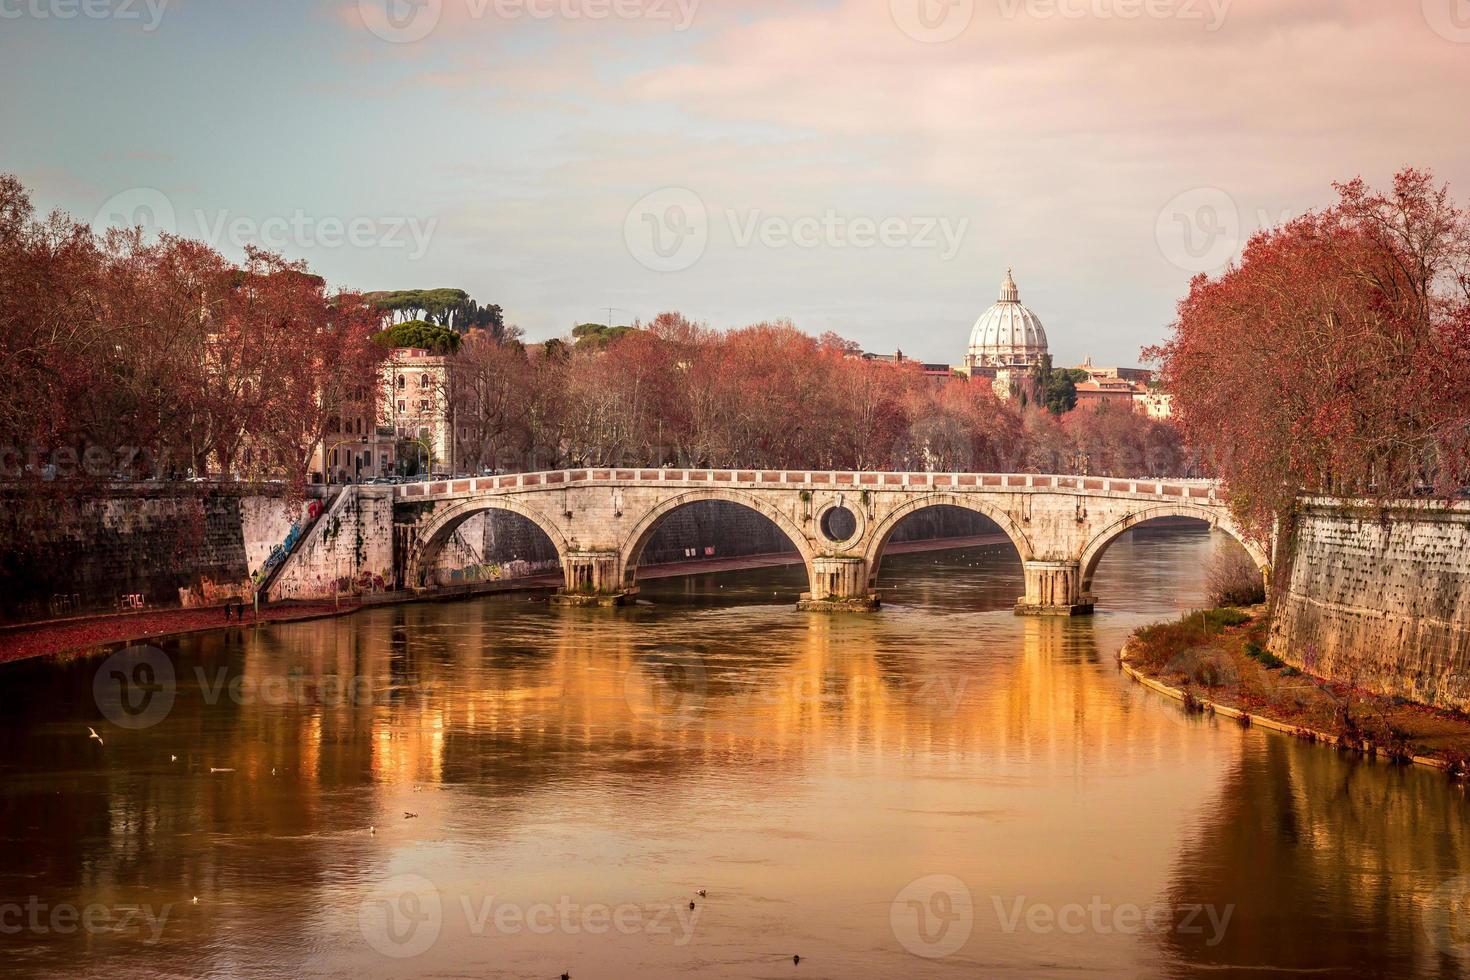 Roma-ntic view of Rome photo